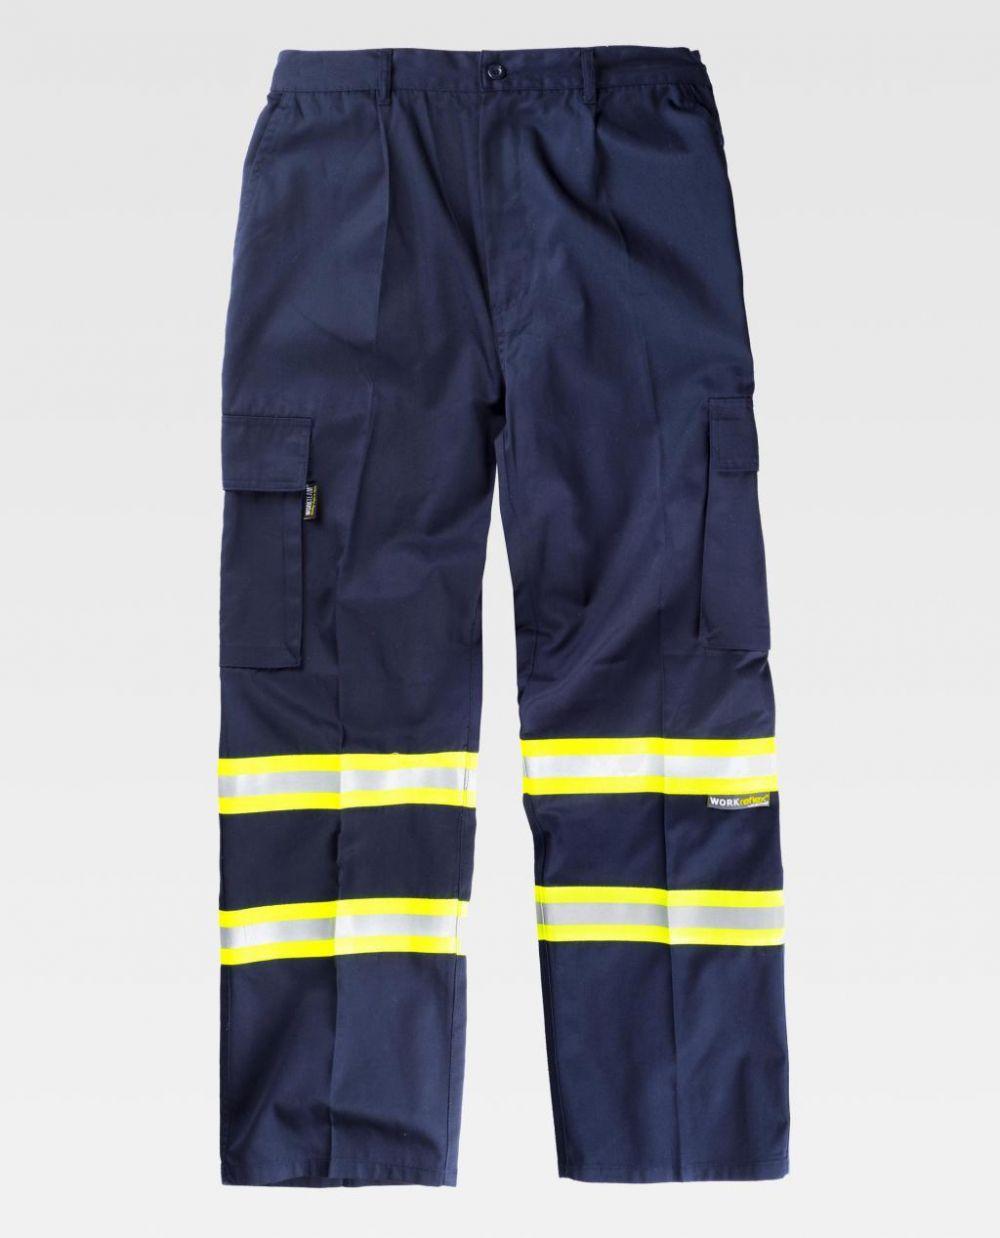 Pantalones reflectantes workteam recto fluorescentes de poliéster para personalizar vista 1